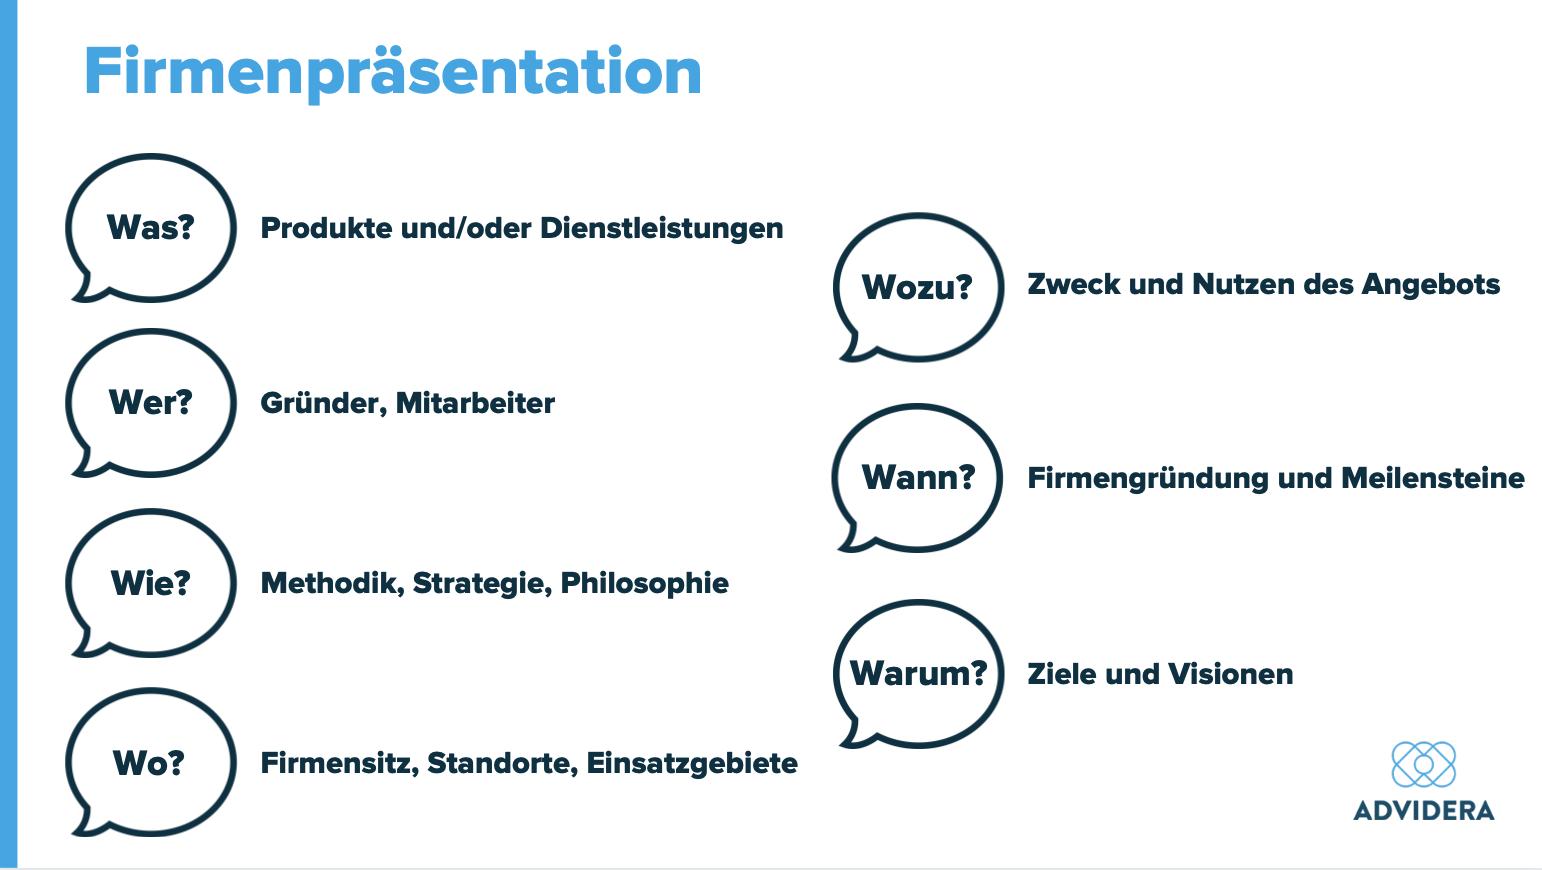 Firmenpräsentation W-Fragen